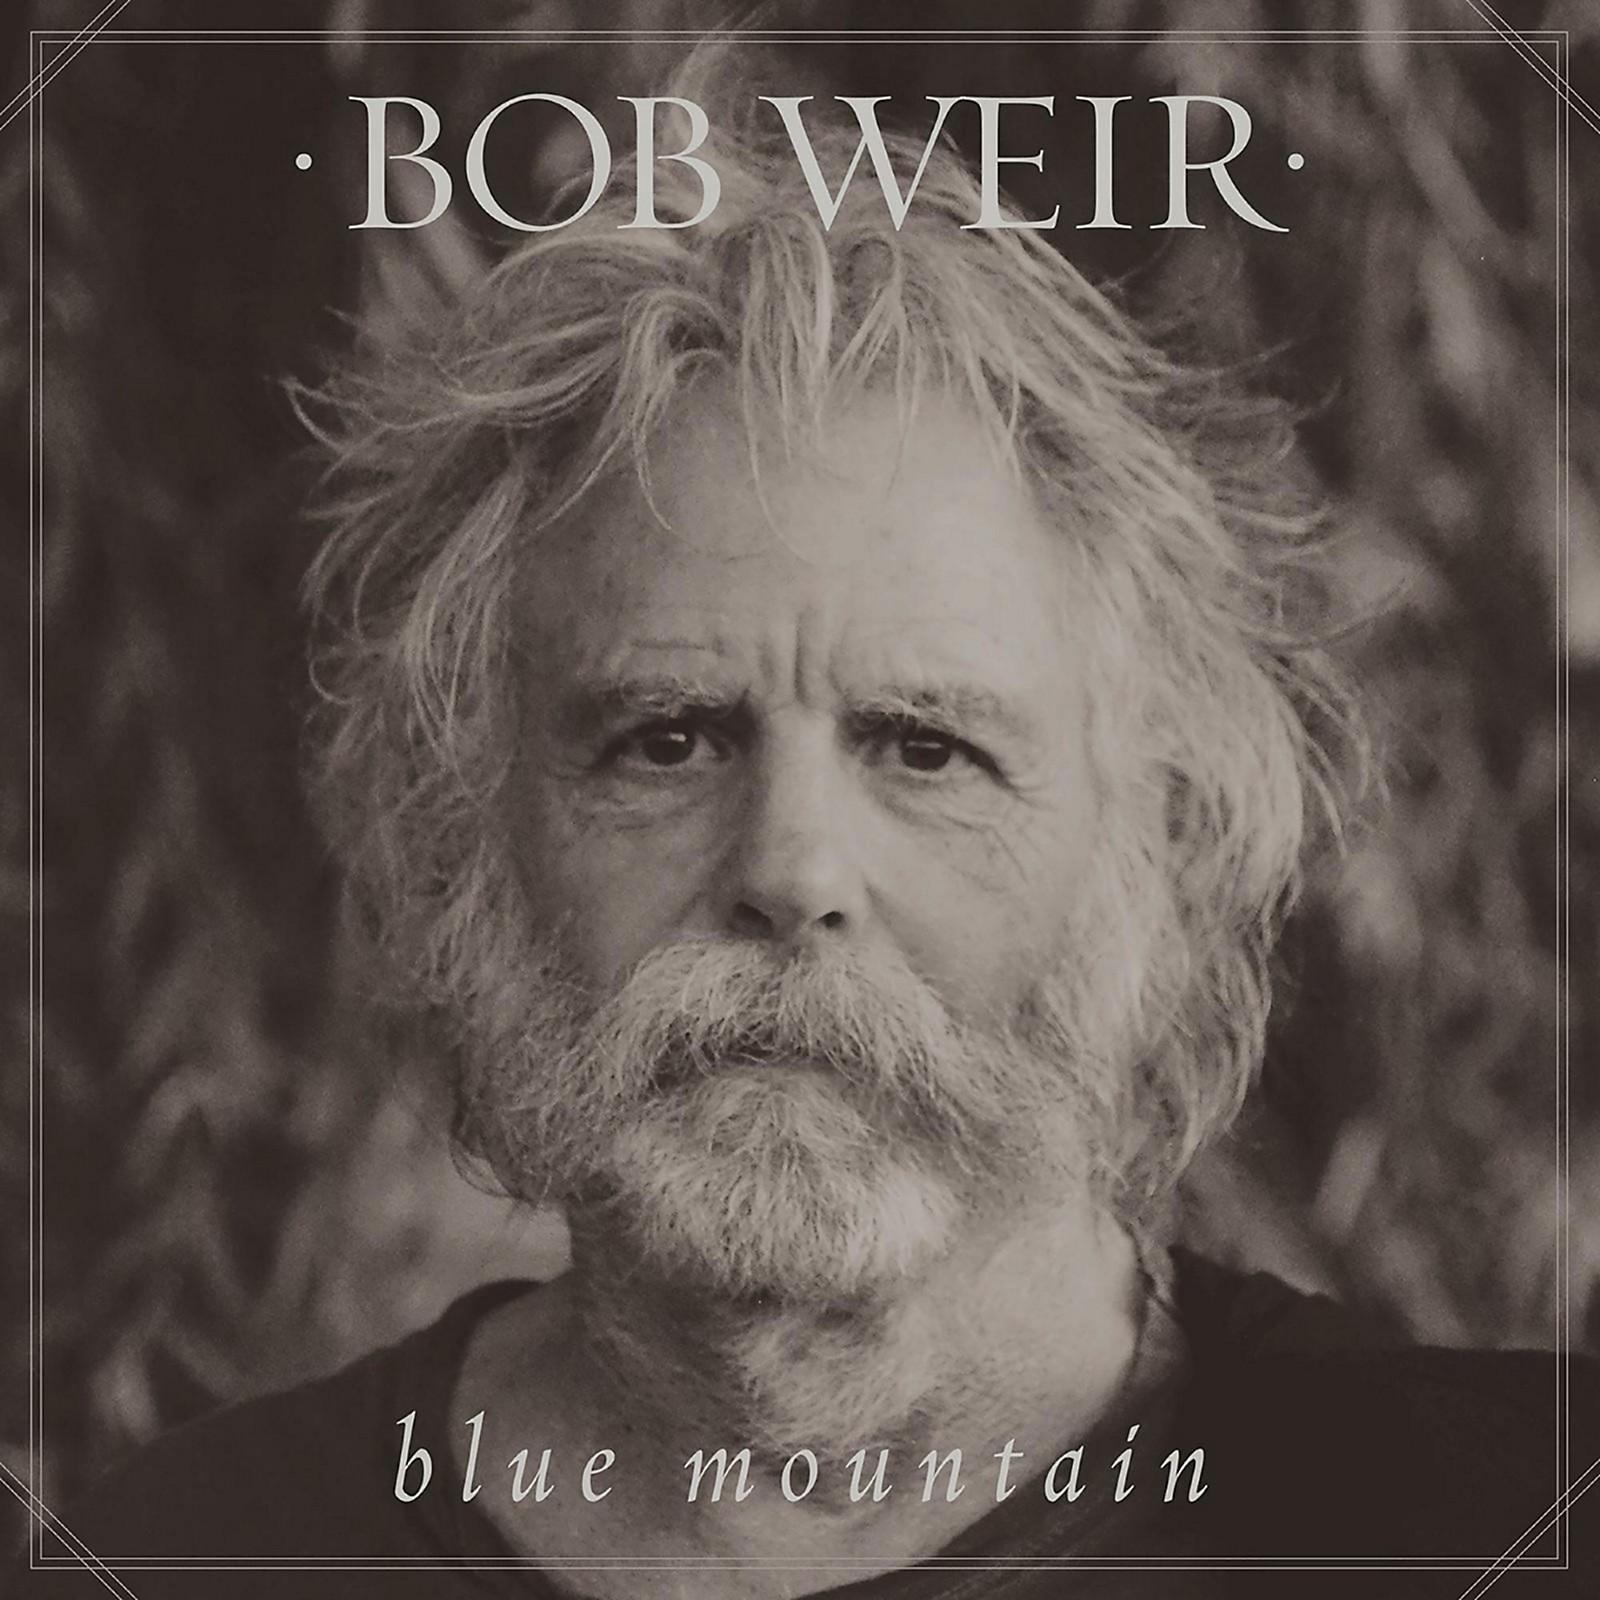 Sony Bob Weir - Blue Mountain